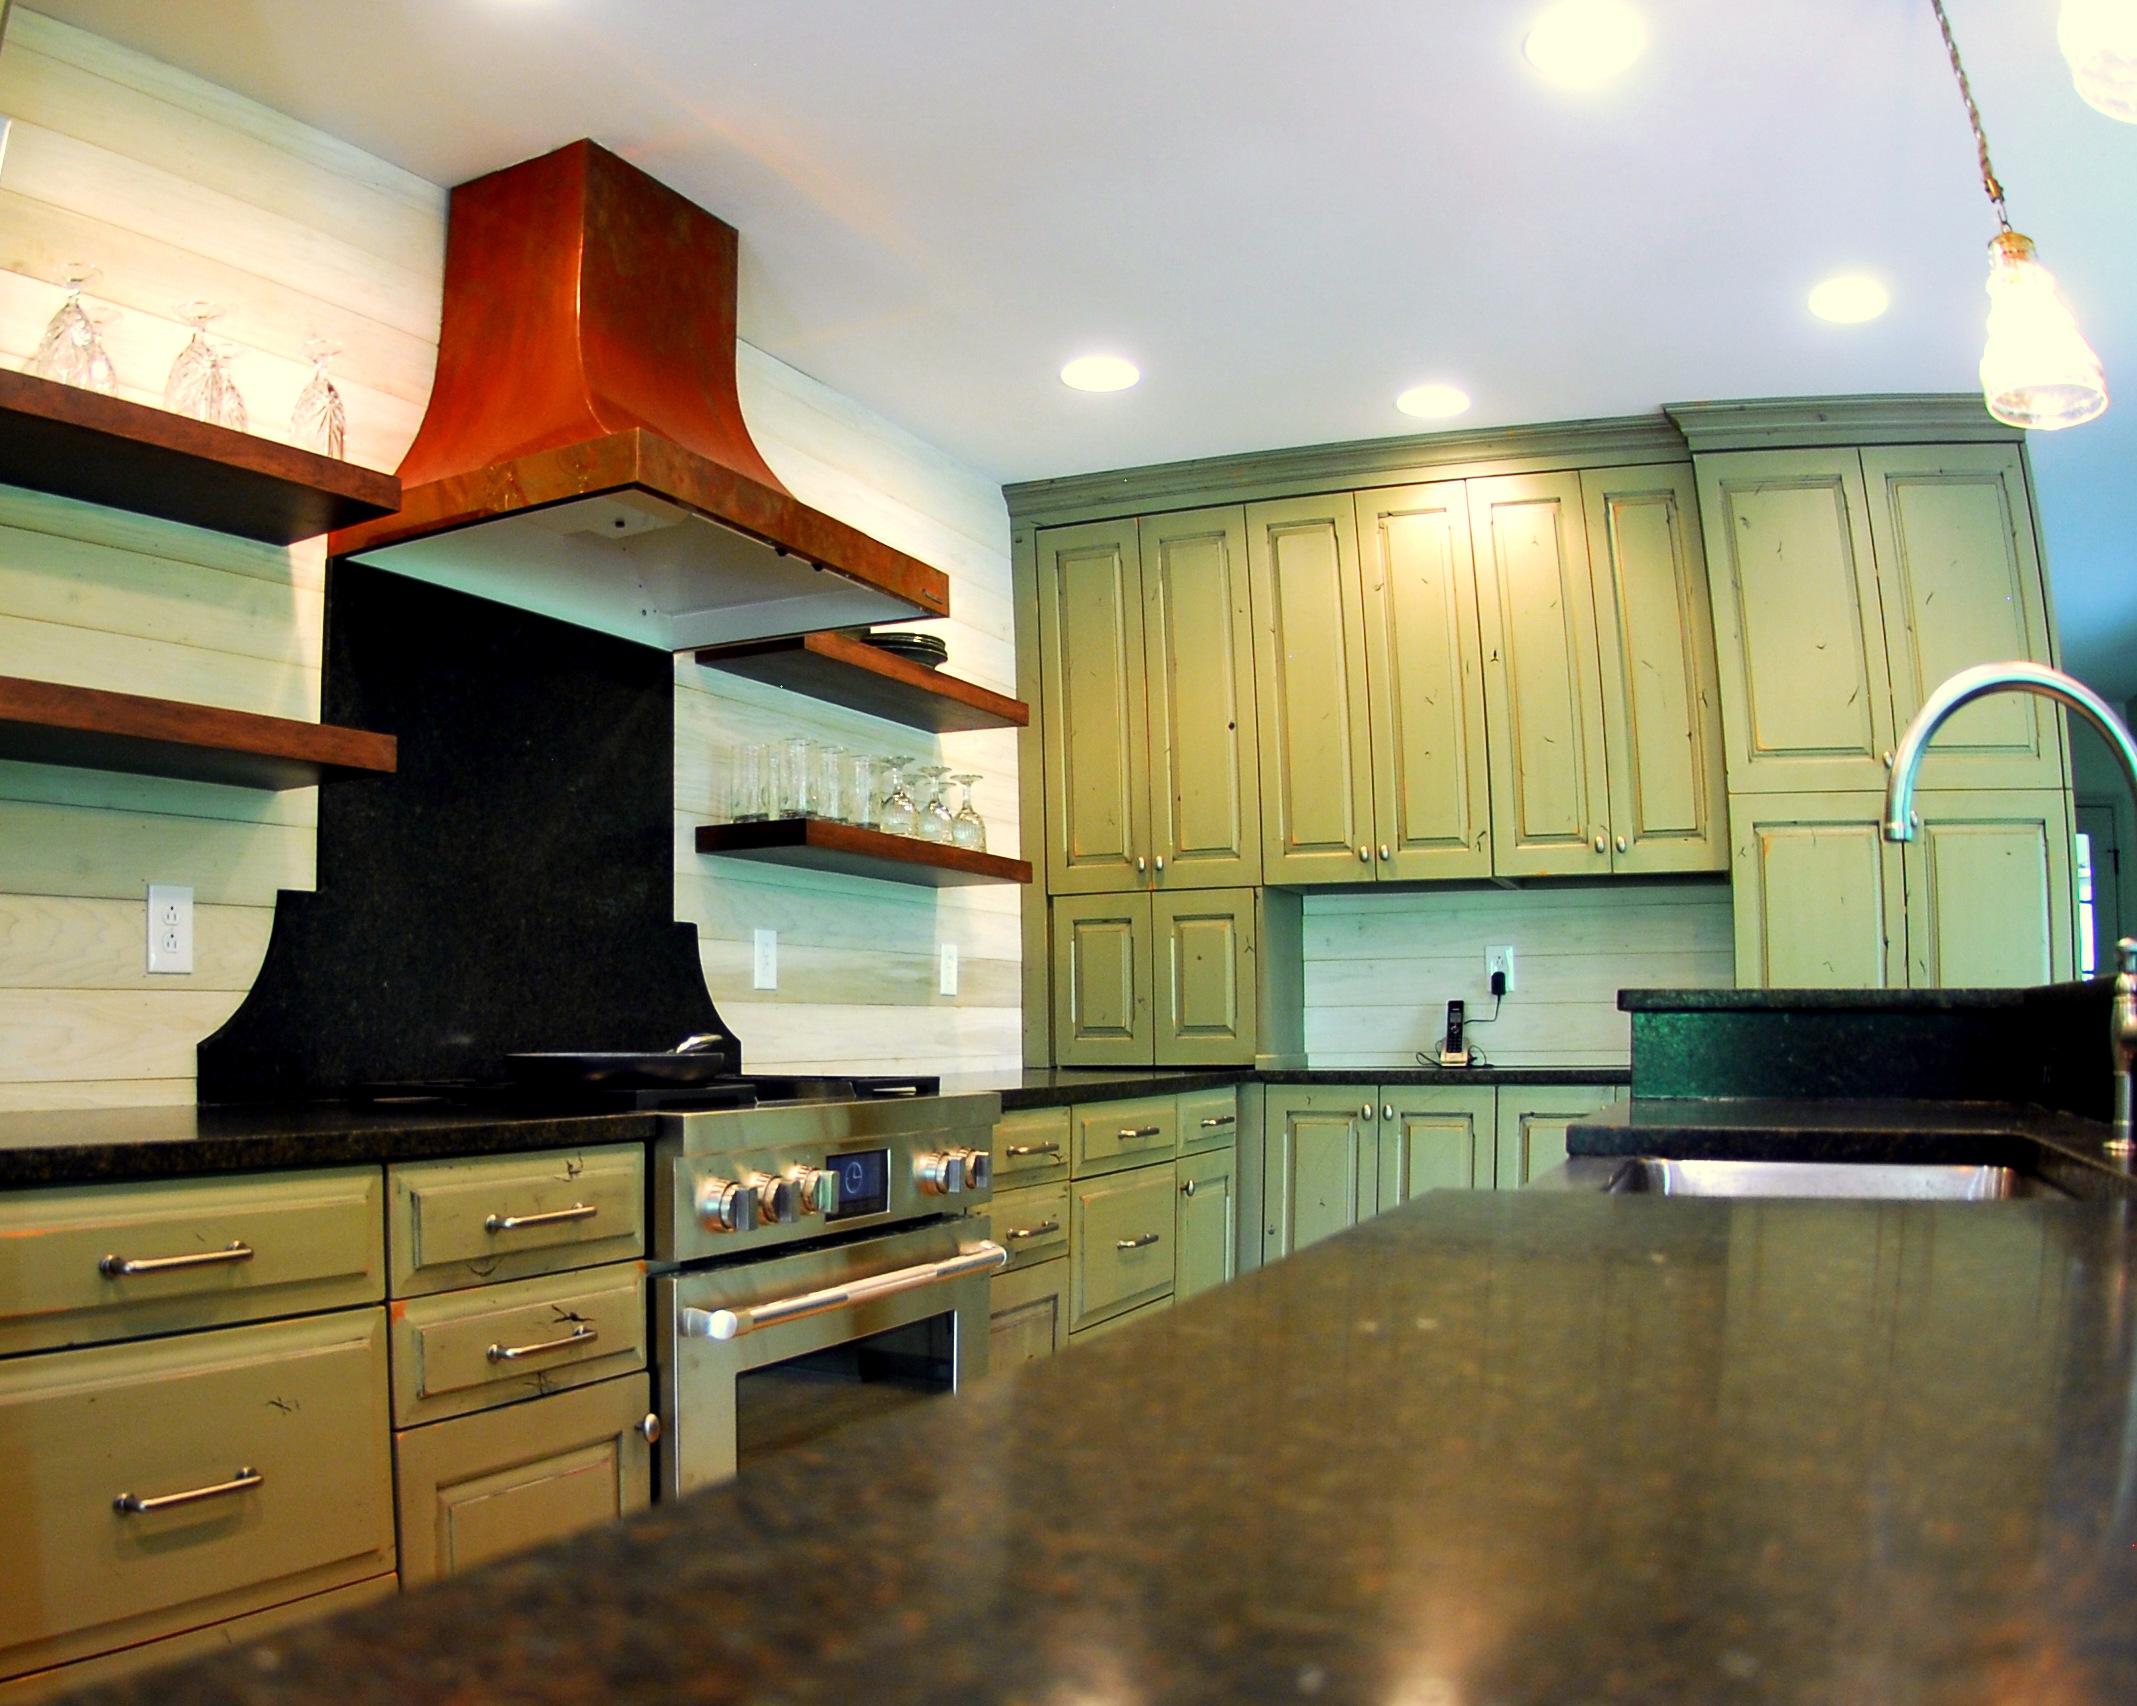 Smyer Lake Rustic Kitchen